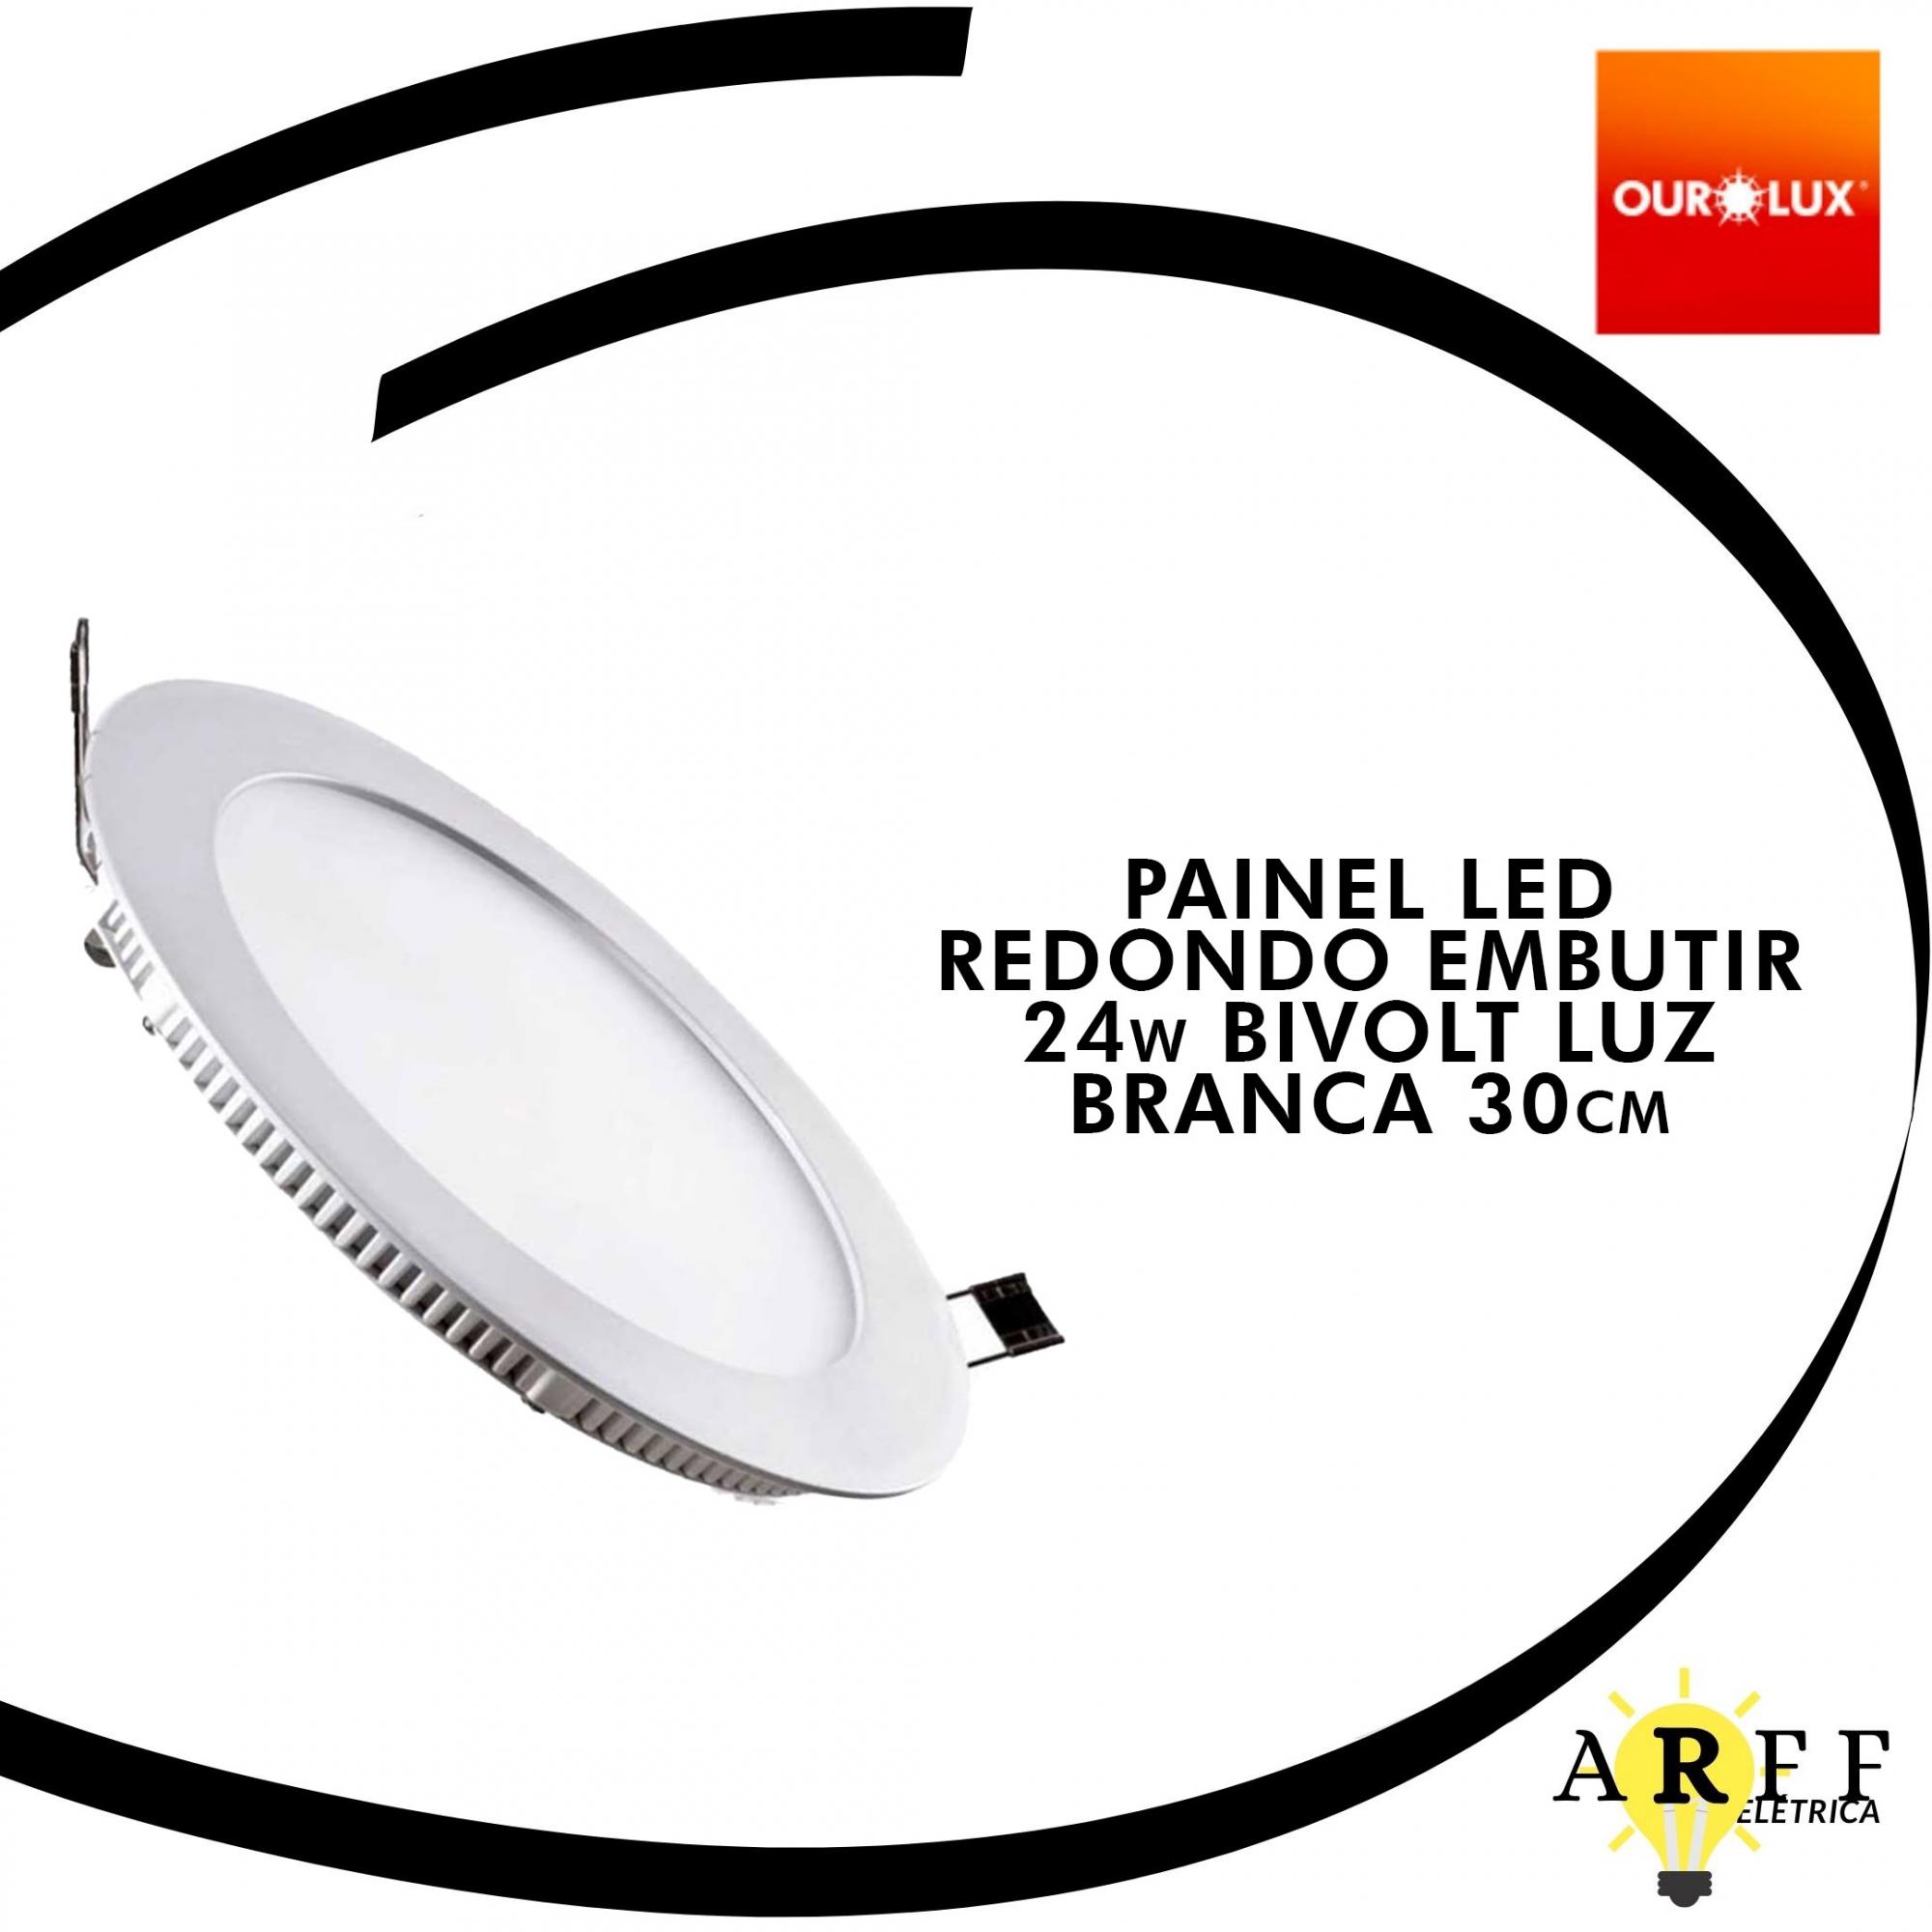 Painel Led Redondo Embutir 24W Bivolt Luz Branca 30cm